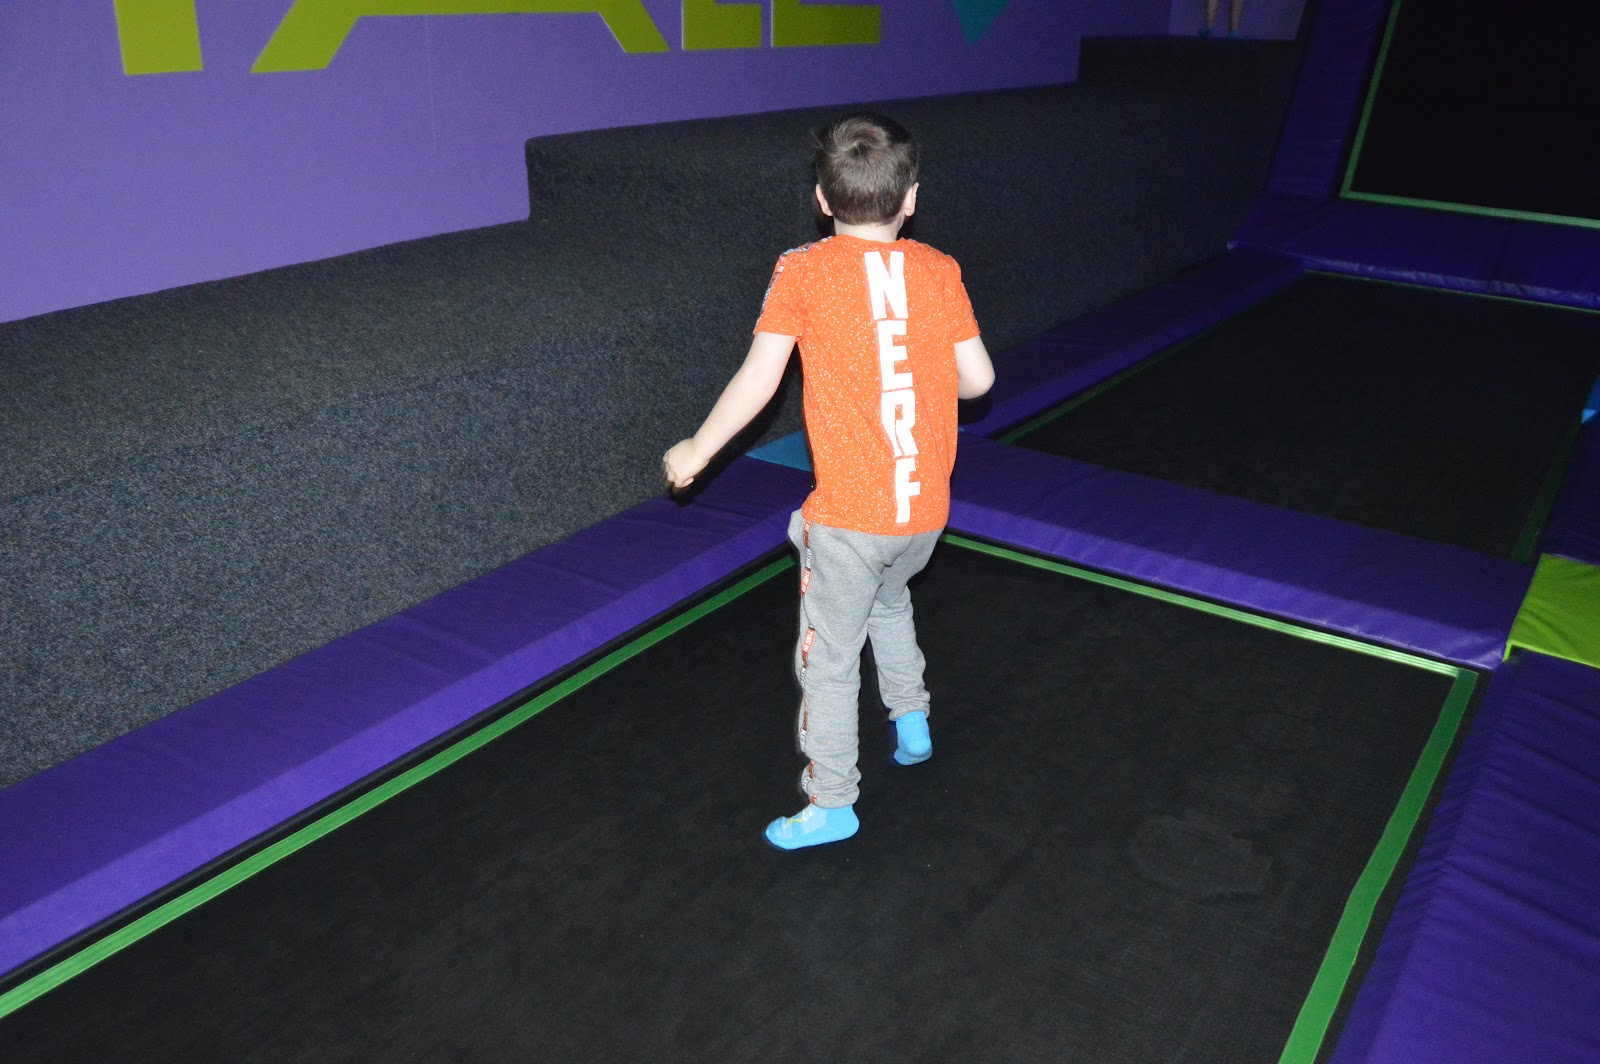 boy standing in a trampoline park